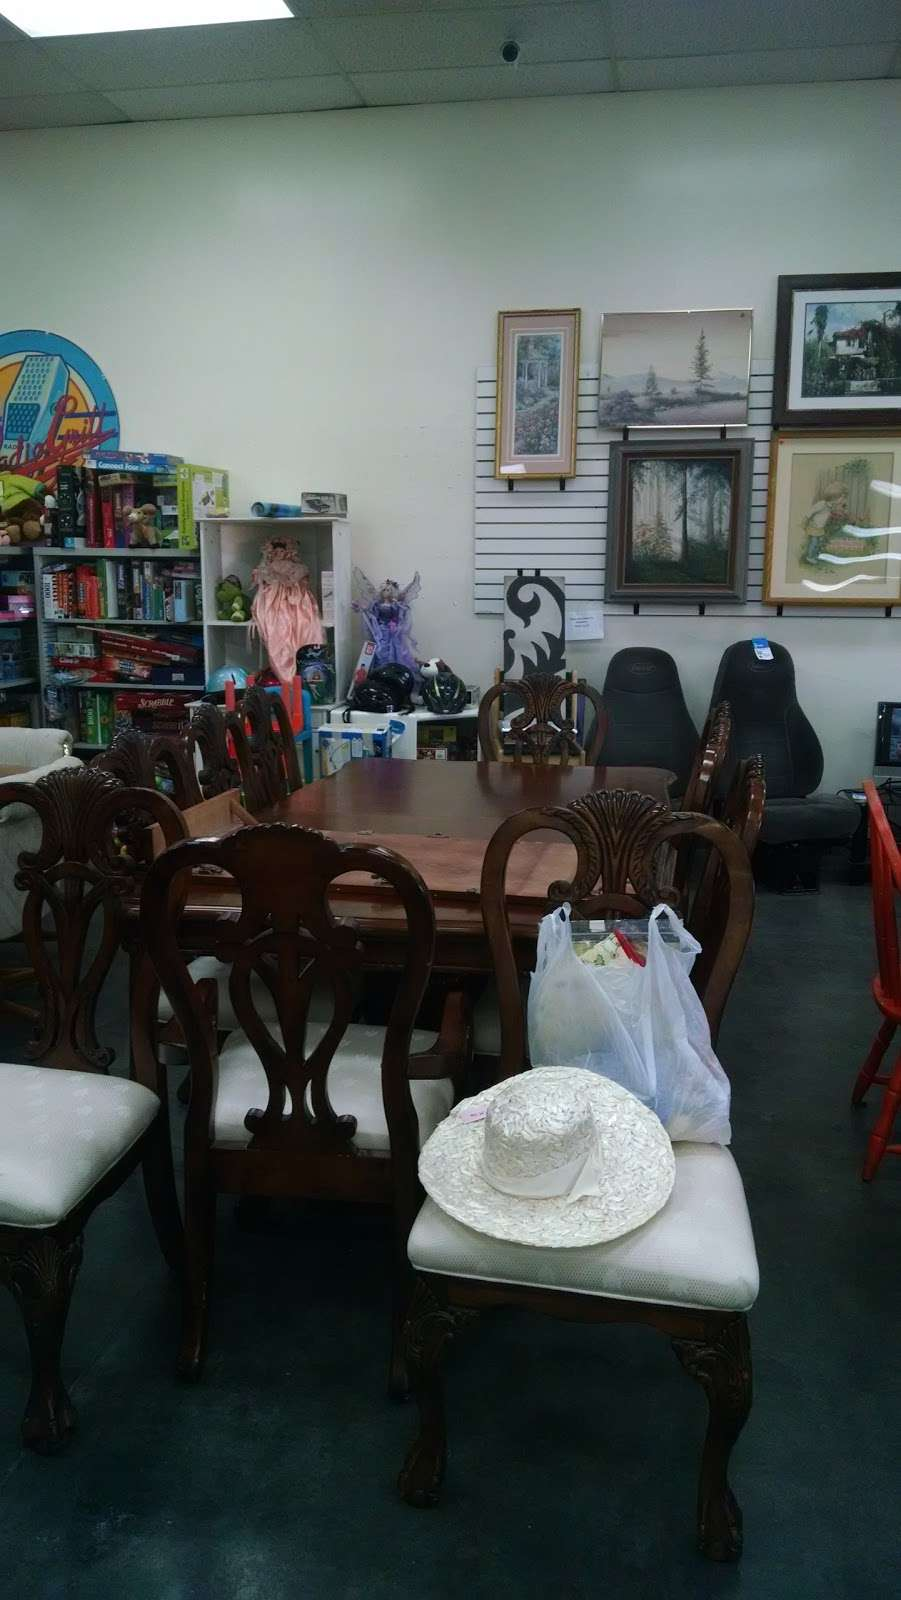 Society of St. Vincent de Paul - Chandler Thrift Store - book store  | Photo 8 of 10 | Address: 963 W Elliot Rd, Chandler, AZ 85225, USA | Phone: (480) 812-1156